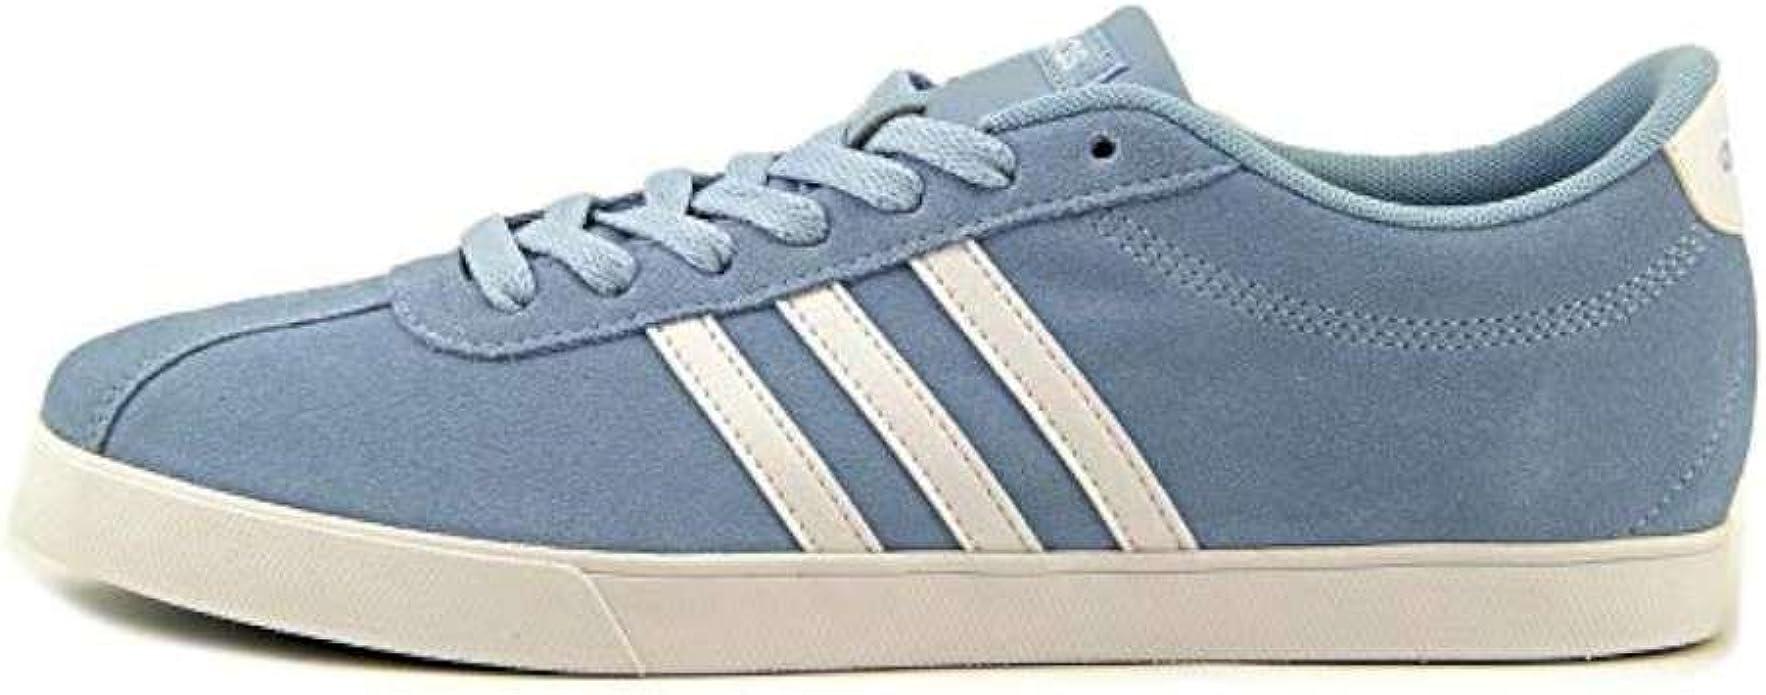 adidas - Neo Femme, Bleu (Lt Sky Blue), 38 EU: Amazon.fr ...